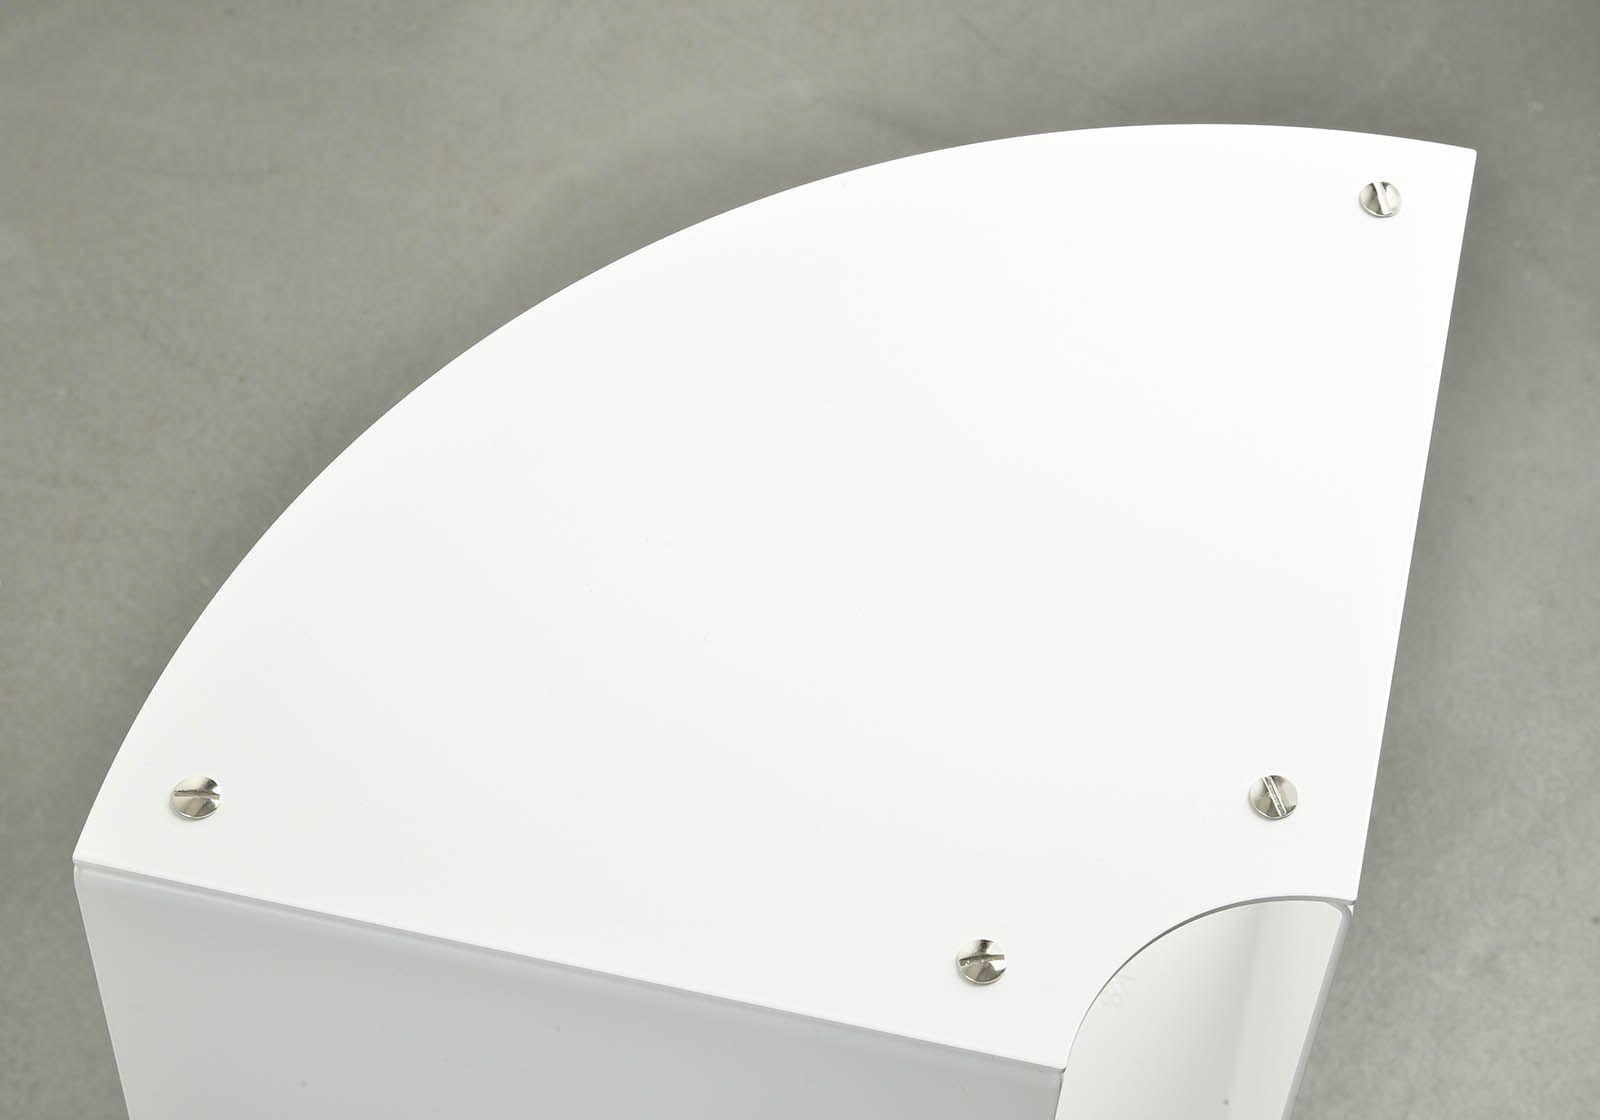 eckregal dangolo stahl 25x25x70cm. Black Bedroom Furniture Sets. Home Design Ideas